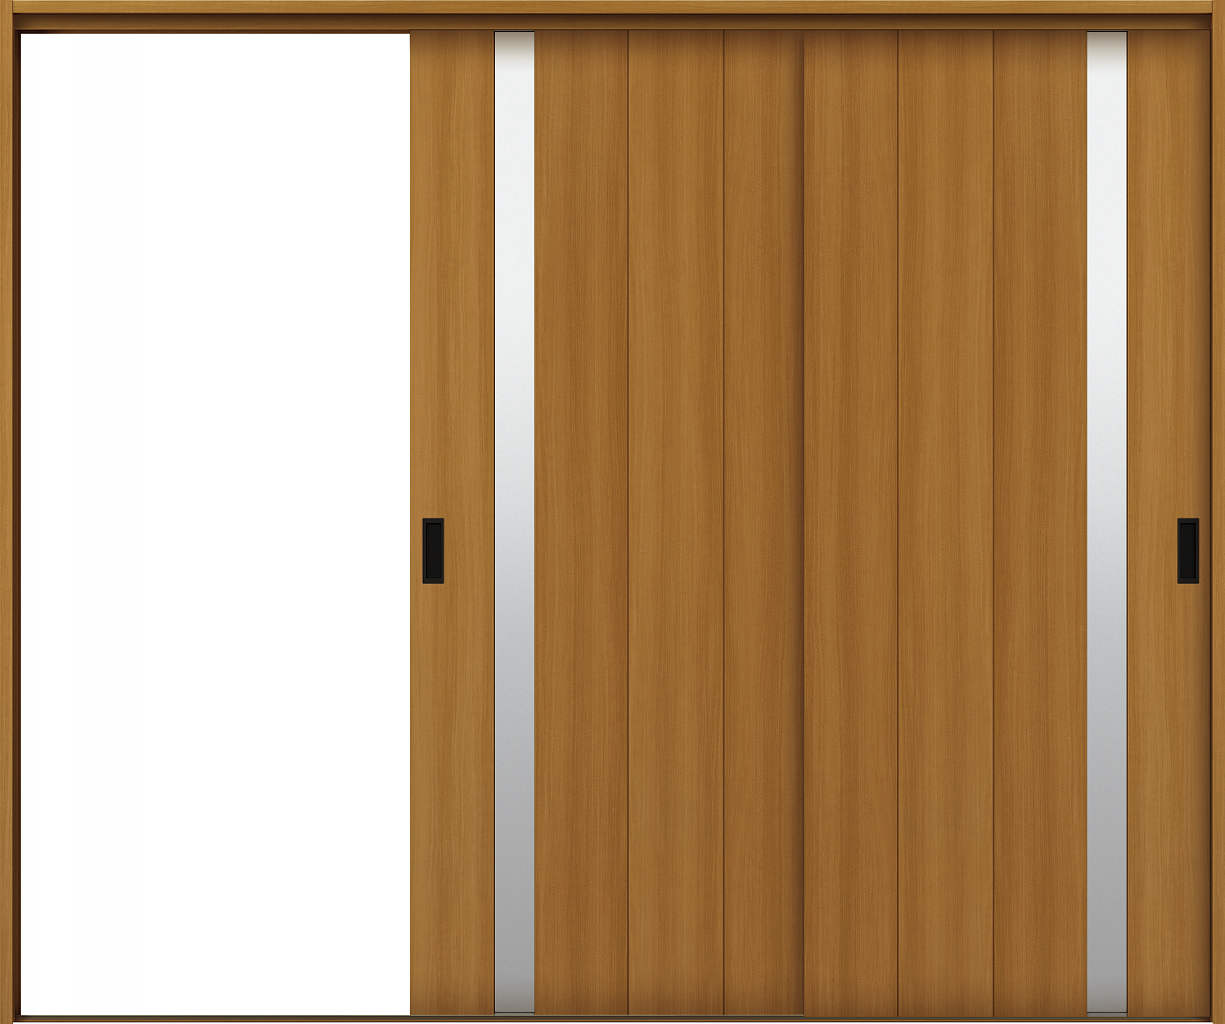 YKKAP室内引戸 ラフォレスタ[スタイリッシュ][木目たて] 2枚片引き戸 T61 ケーシング枠:[幅2433mm×高2033mm]